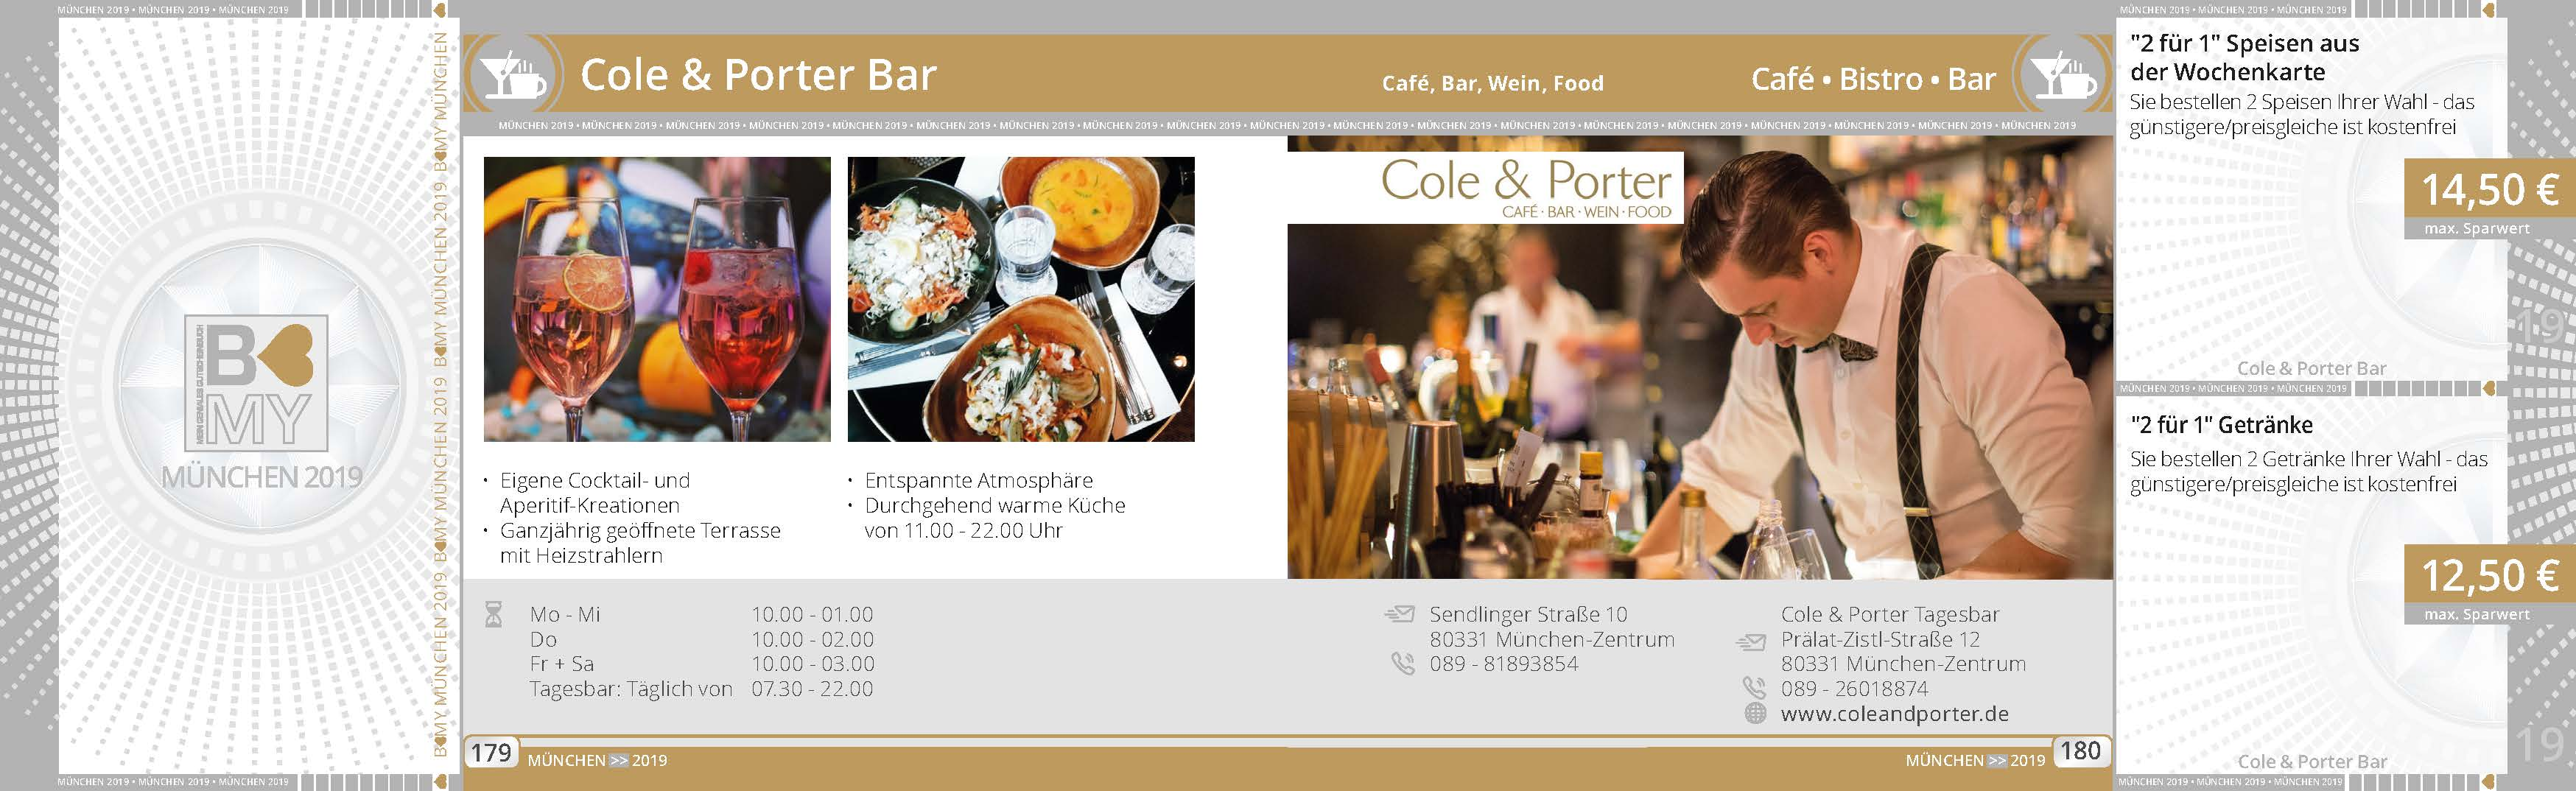 Café - Bistro - Bar | Partner 2019 | staedteherz.de